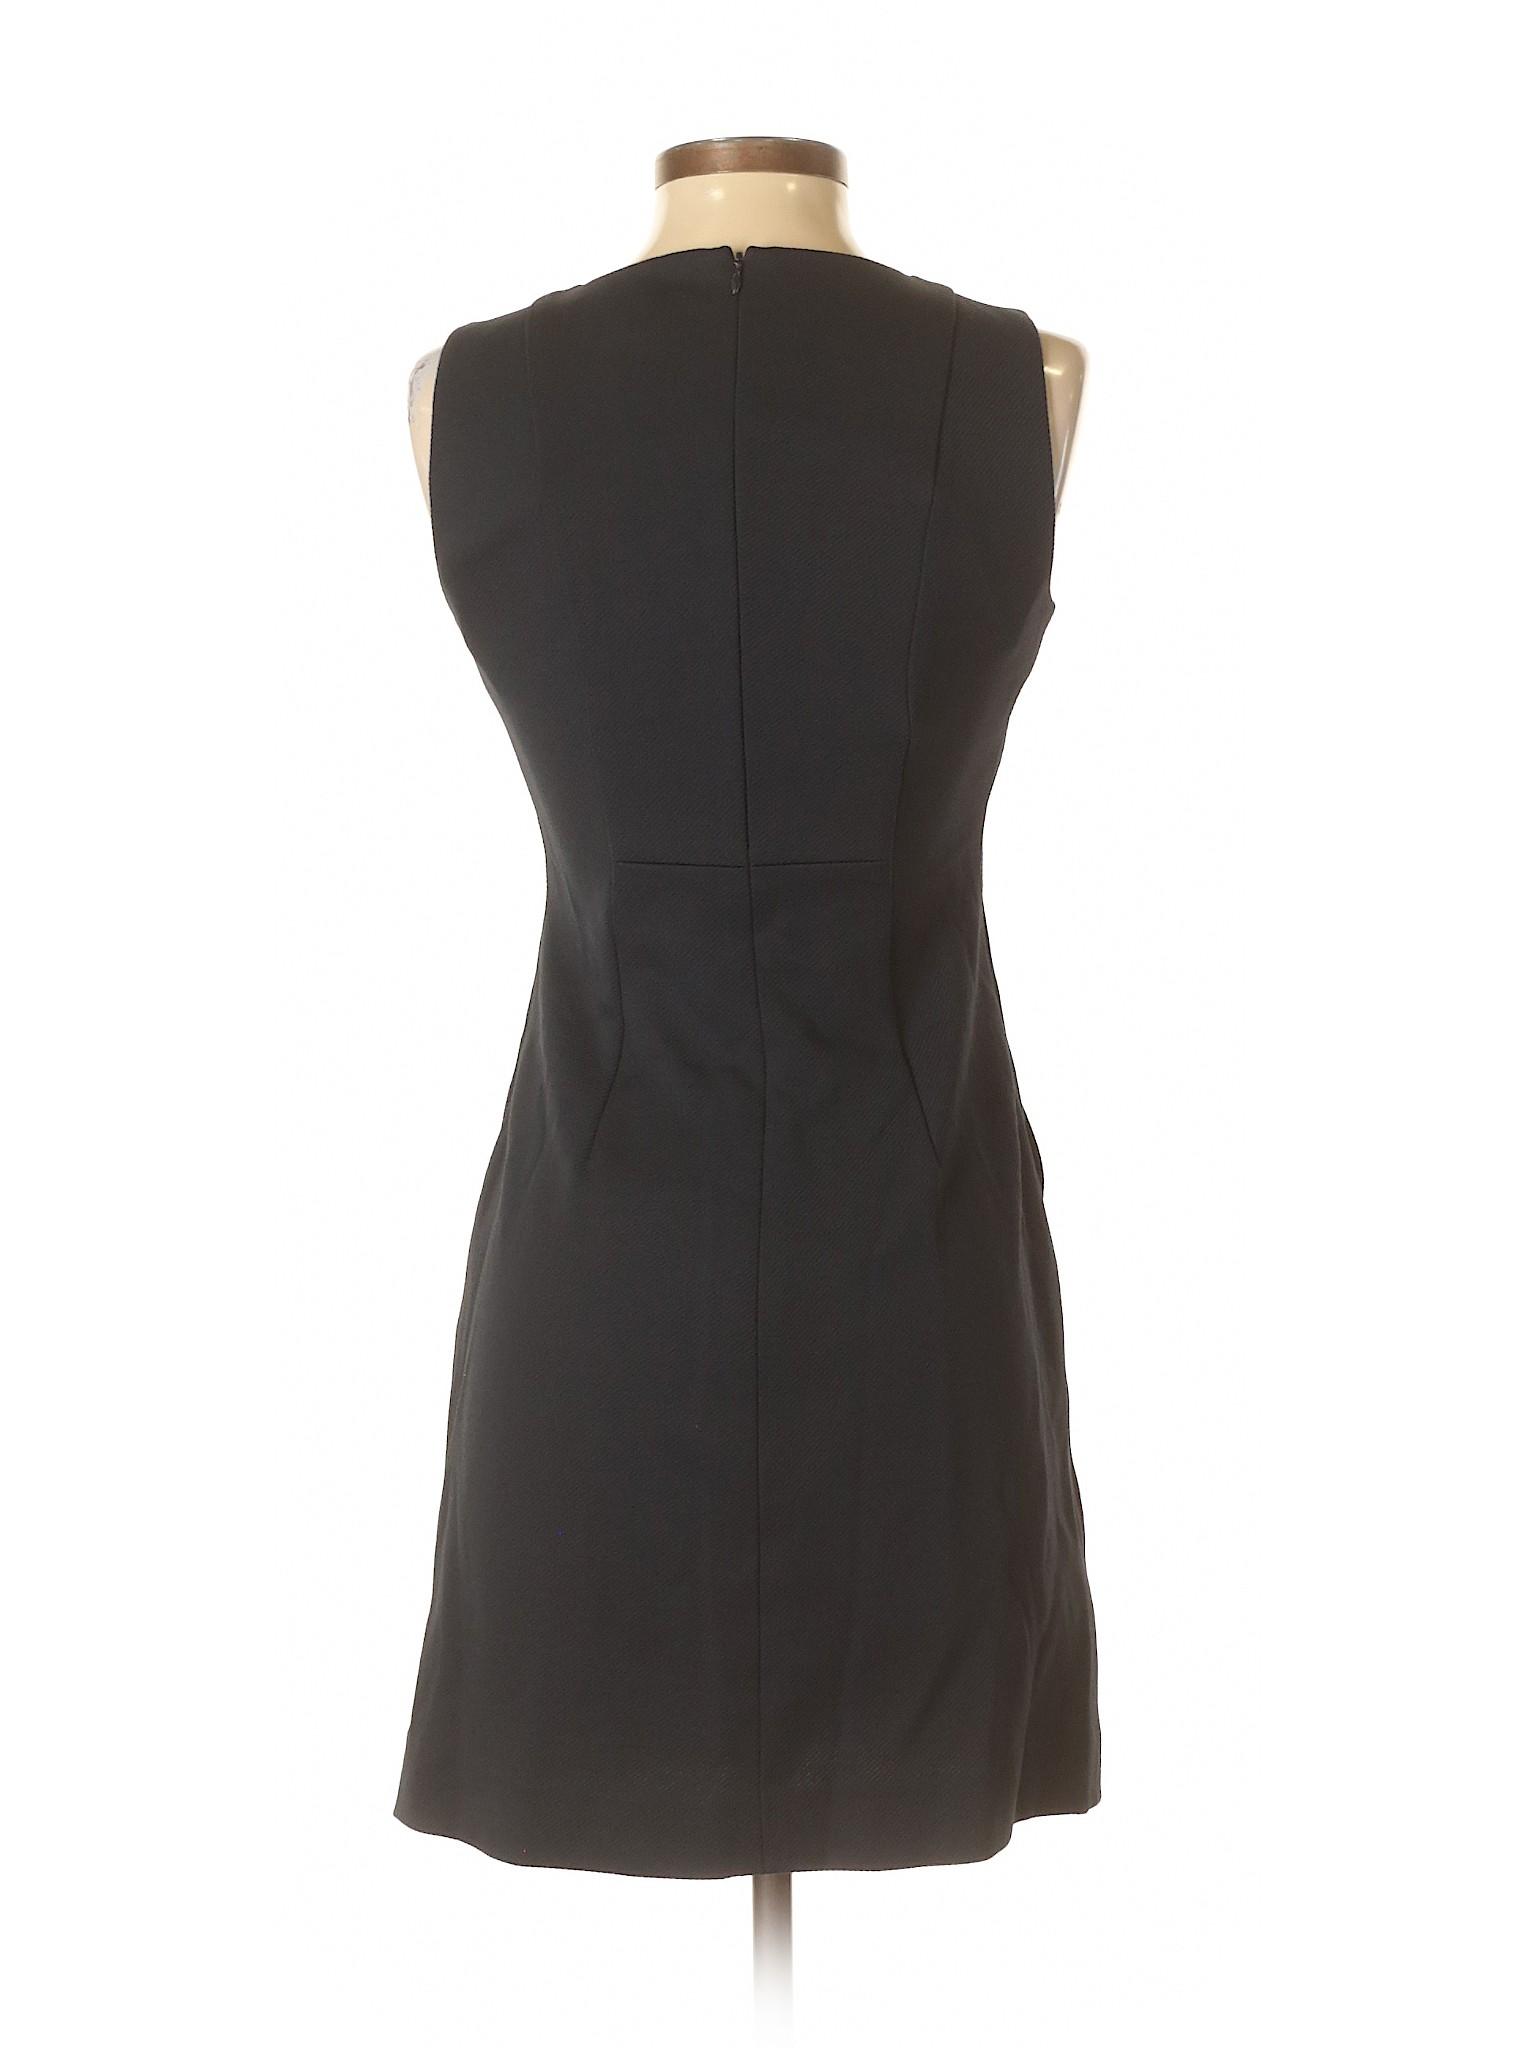 Dress von Casual Selling Diane Furstenberg AYI5xfq